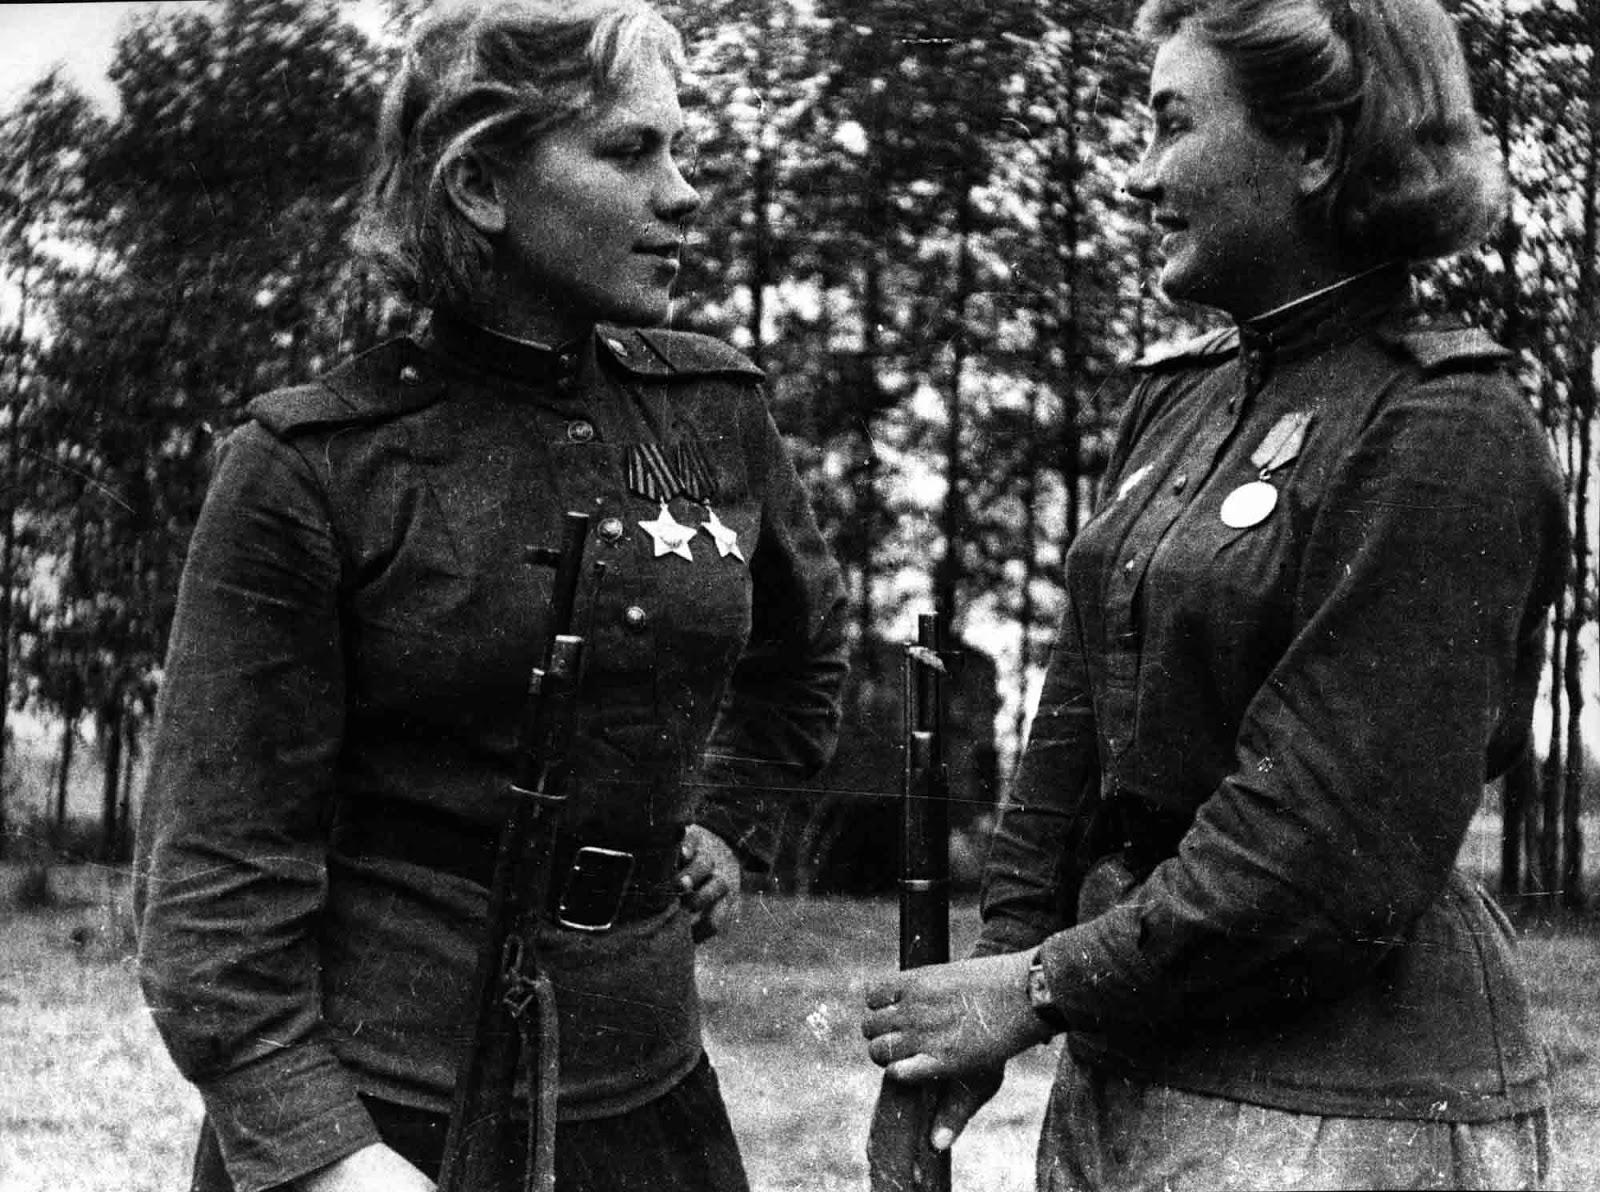 Sergeant Roza Shanina and Junior Sergeant Alexndra Maksimovna Ekimova.